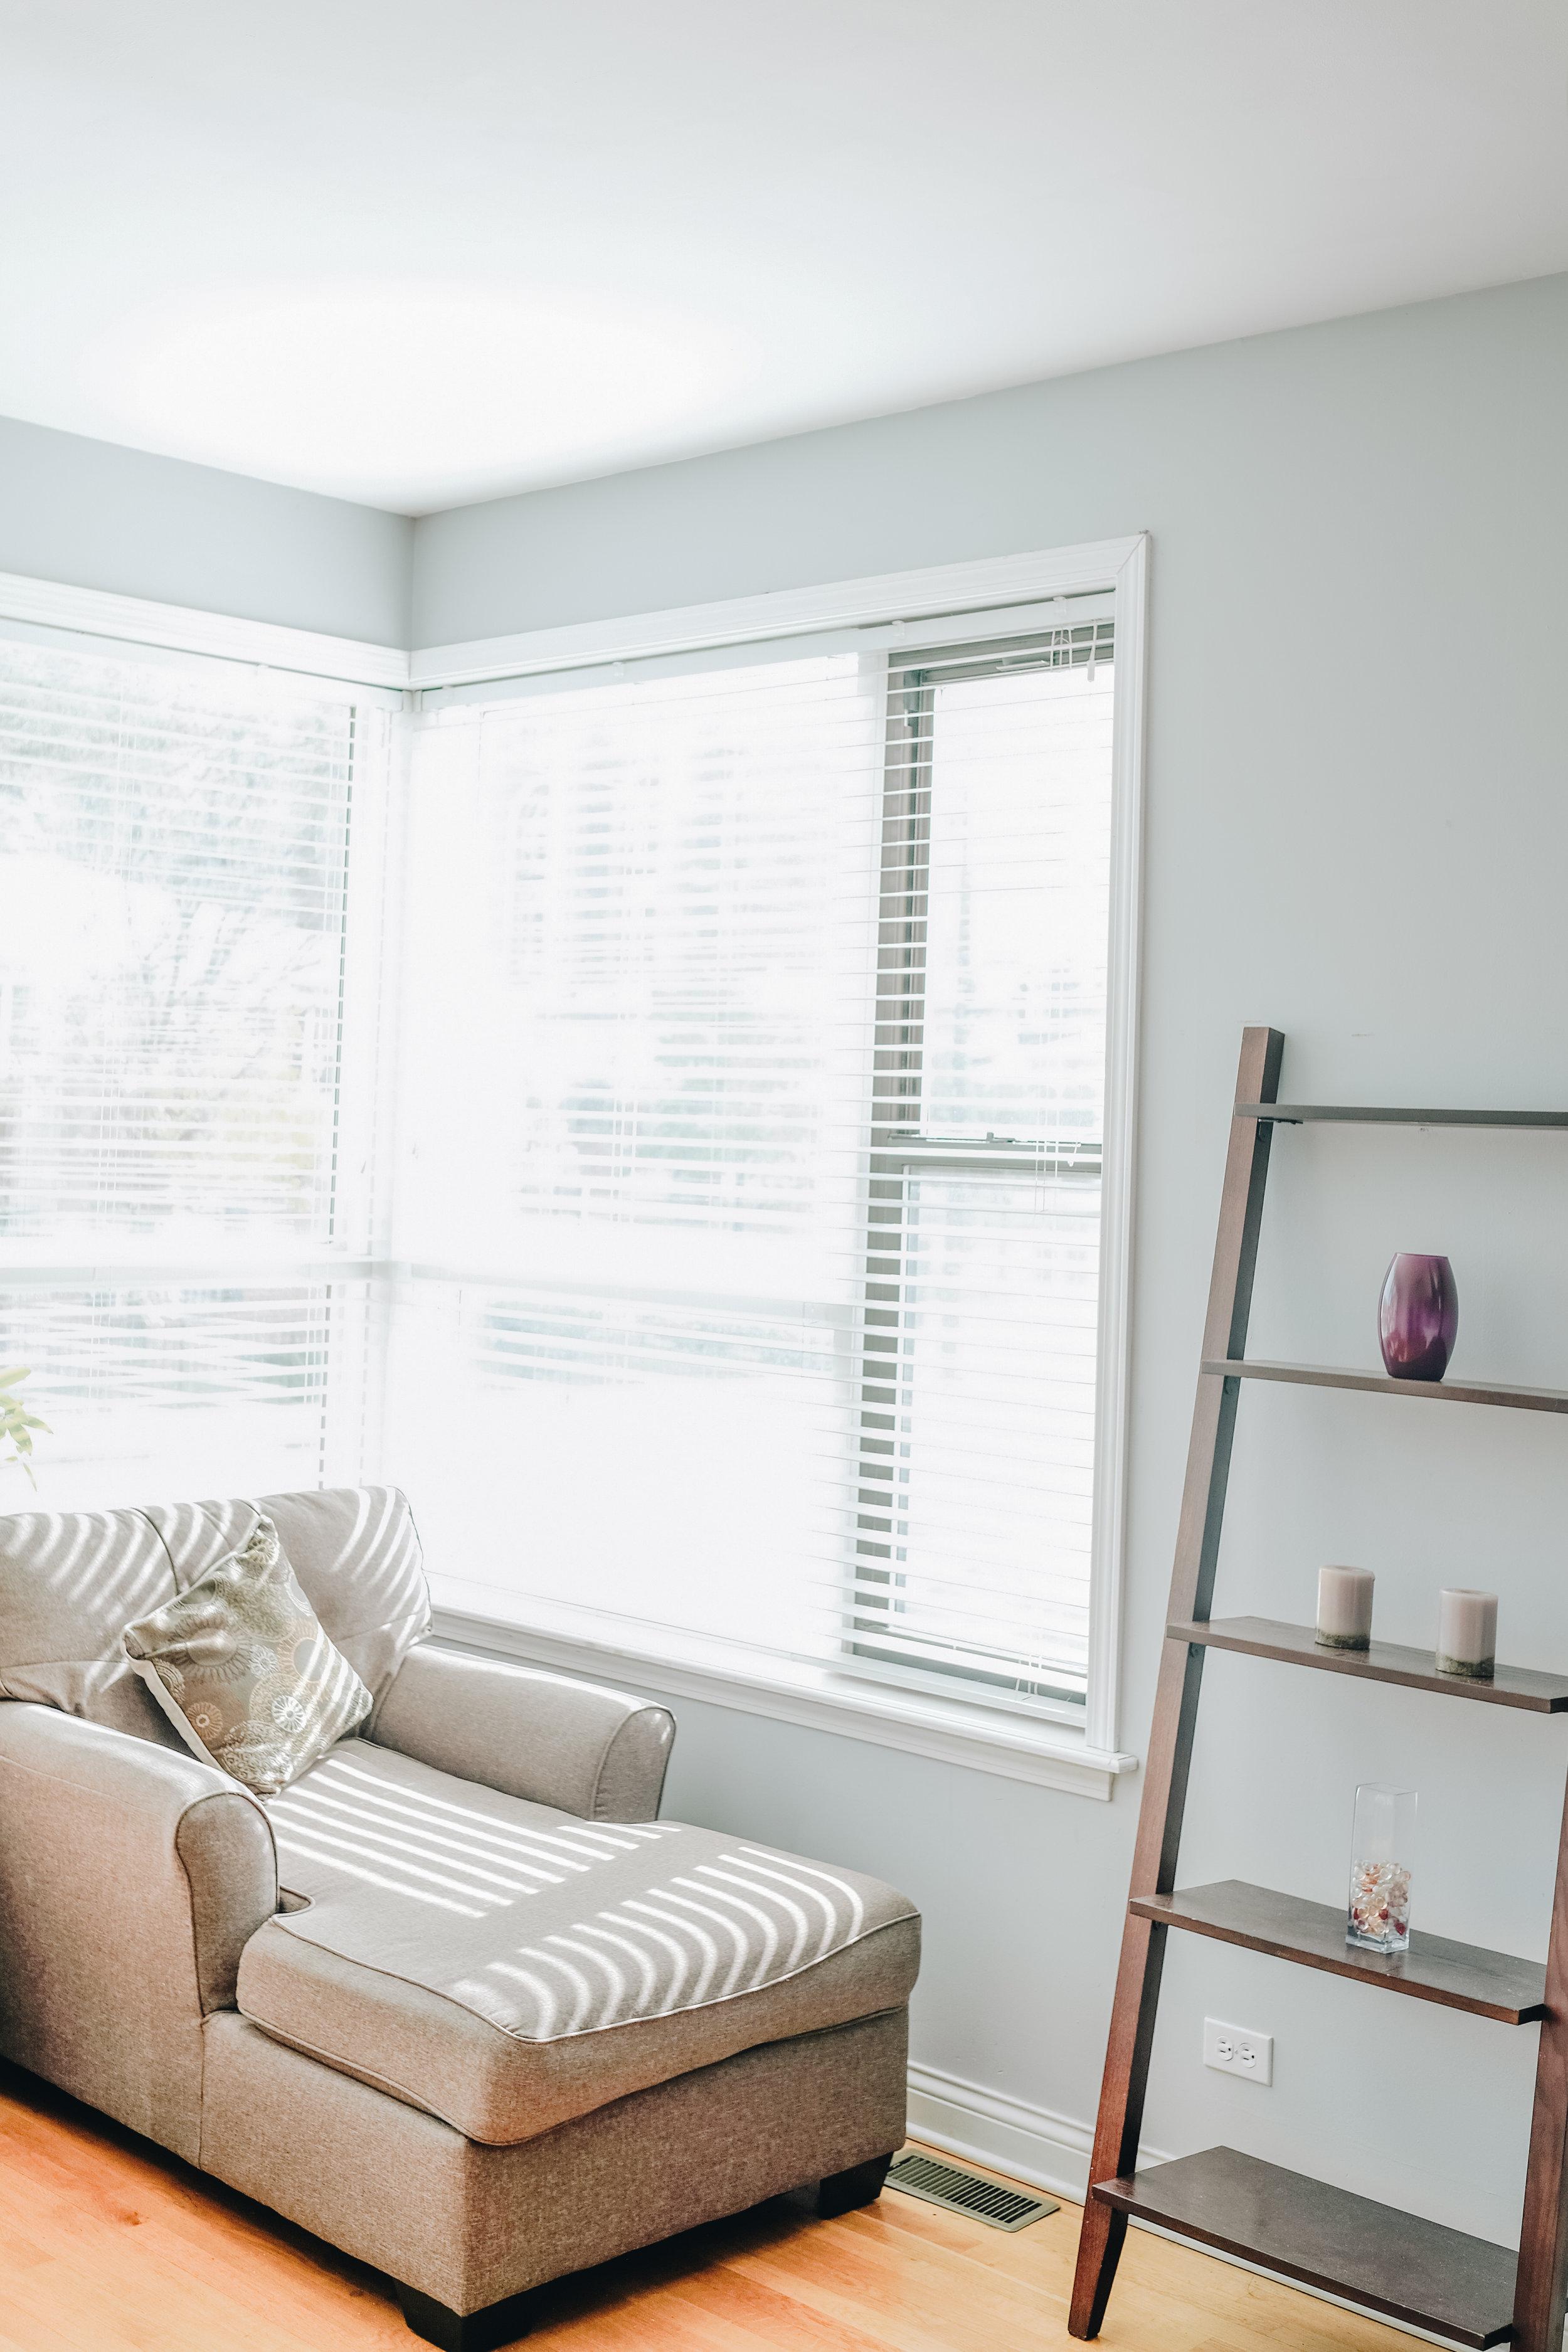 Oakley_Airbnb-2.jpg